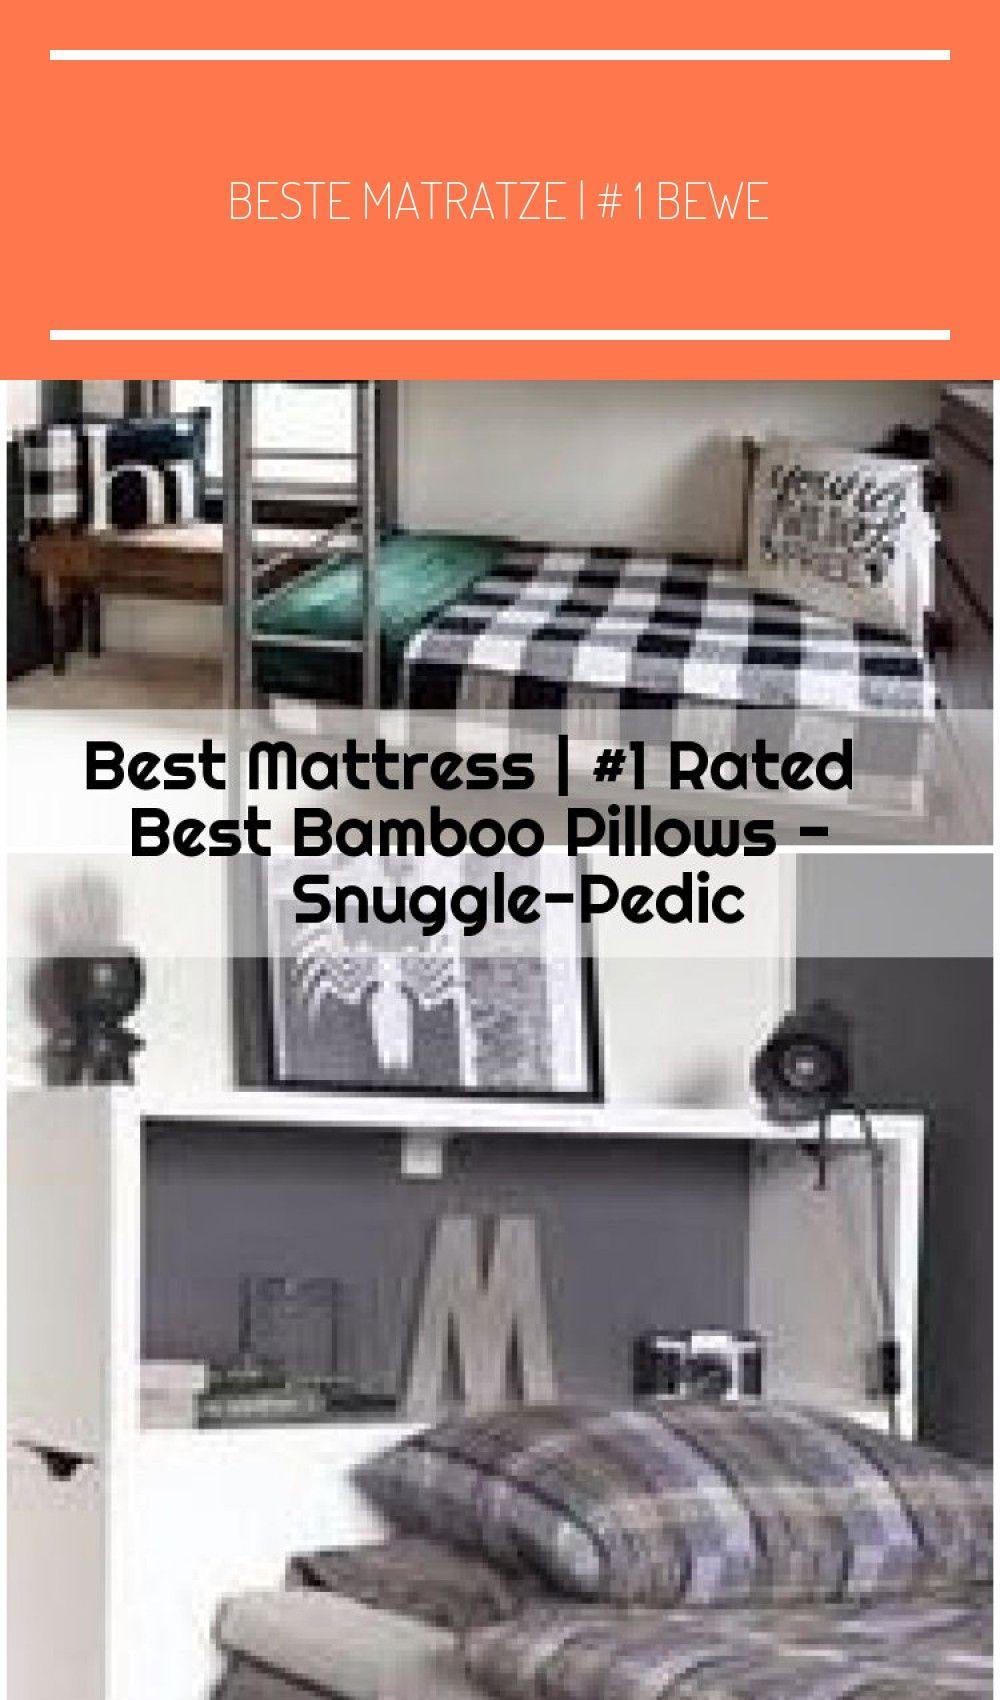 Beste Matratze 1 Bewertetes Bestes Bambuskissen Snuggle Pedic Topferscheune Jungen Schlafzimmer Jungen Schlafzimme In 2020 Best Mattress Bamboo Pillow Mattress